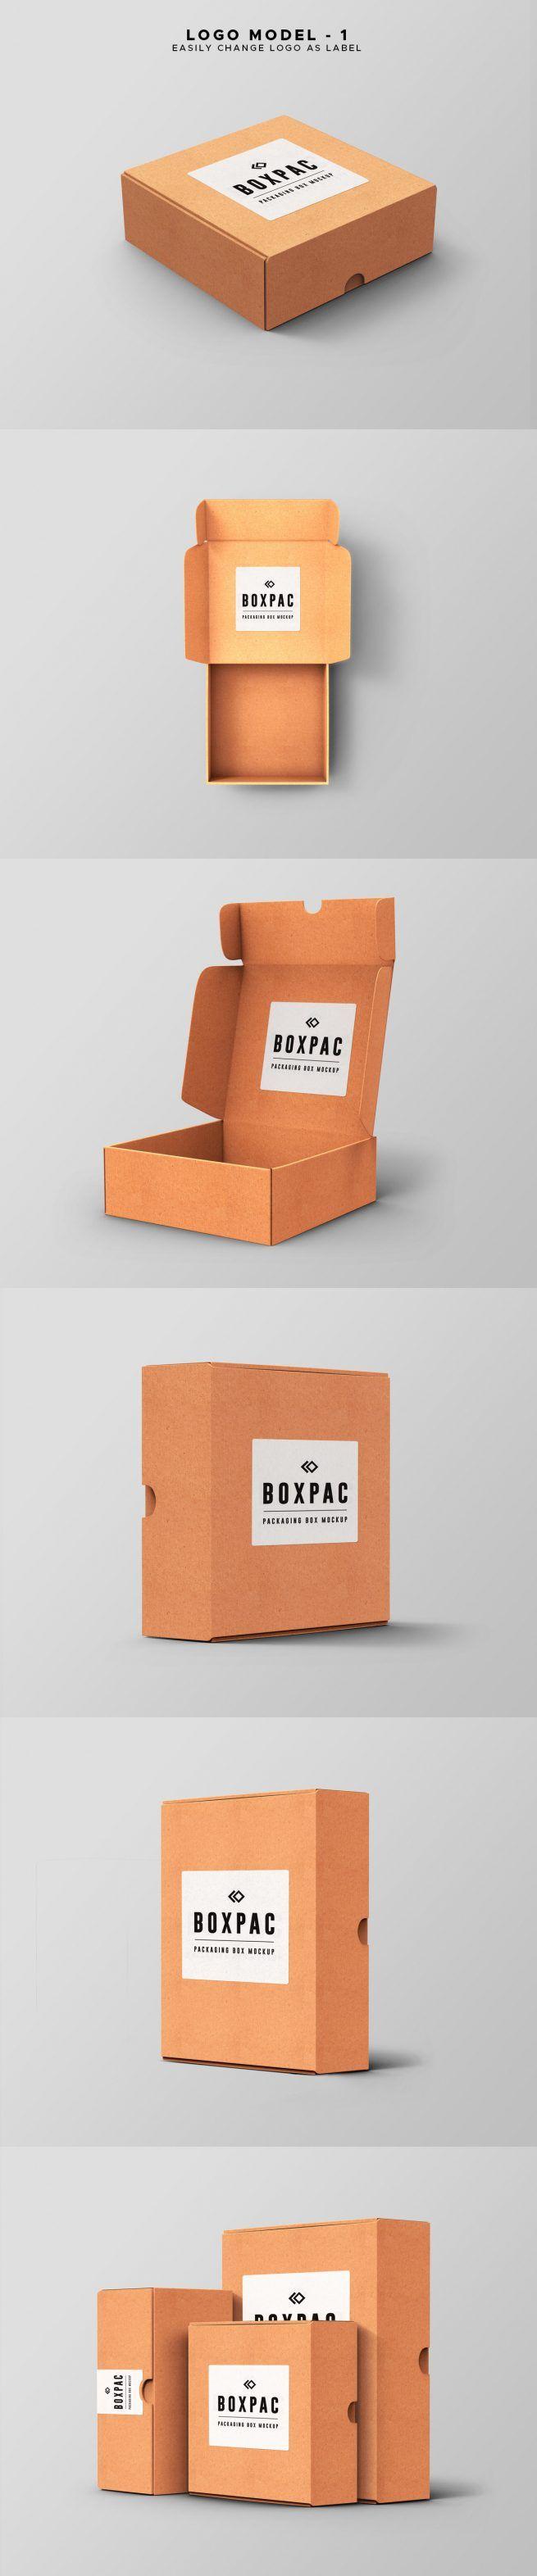 Download Food Packaging Box Psd Mockups Graphicsfuel In 2020 Food Box Packaging Packaging Food Packaging